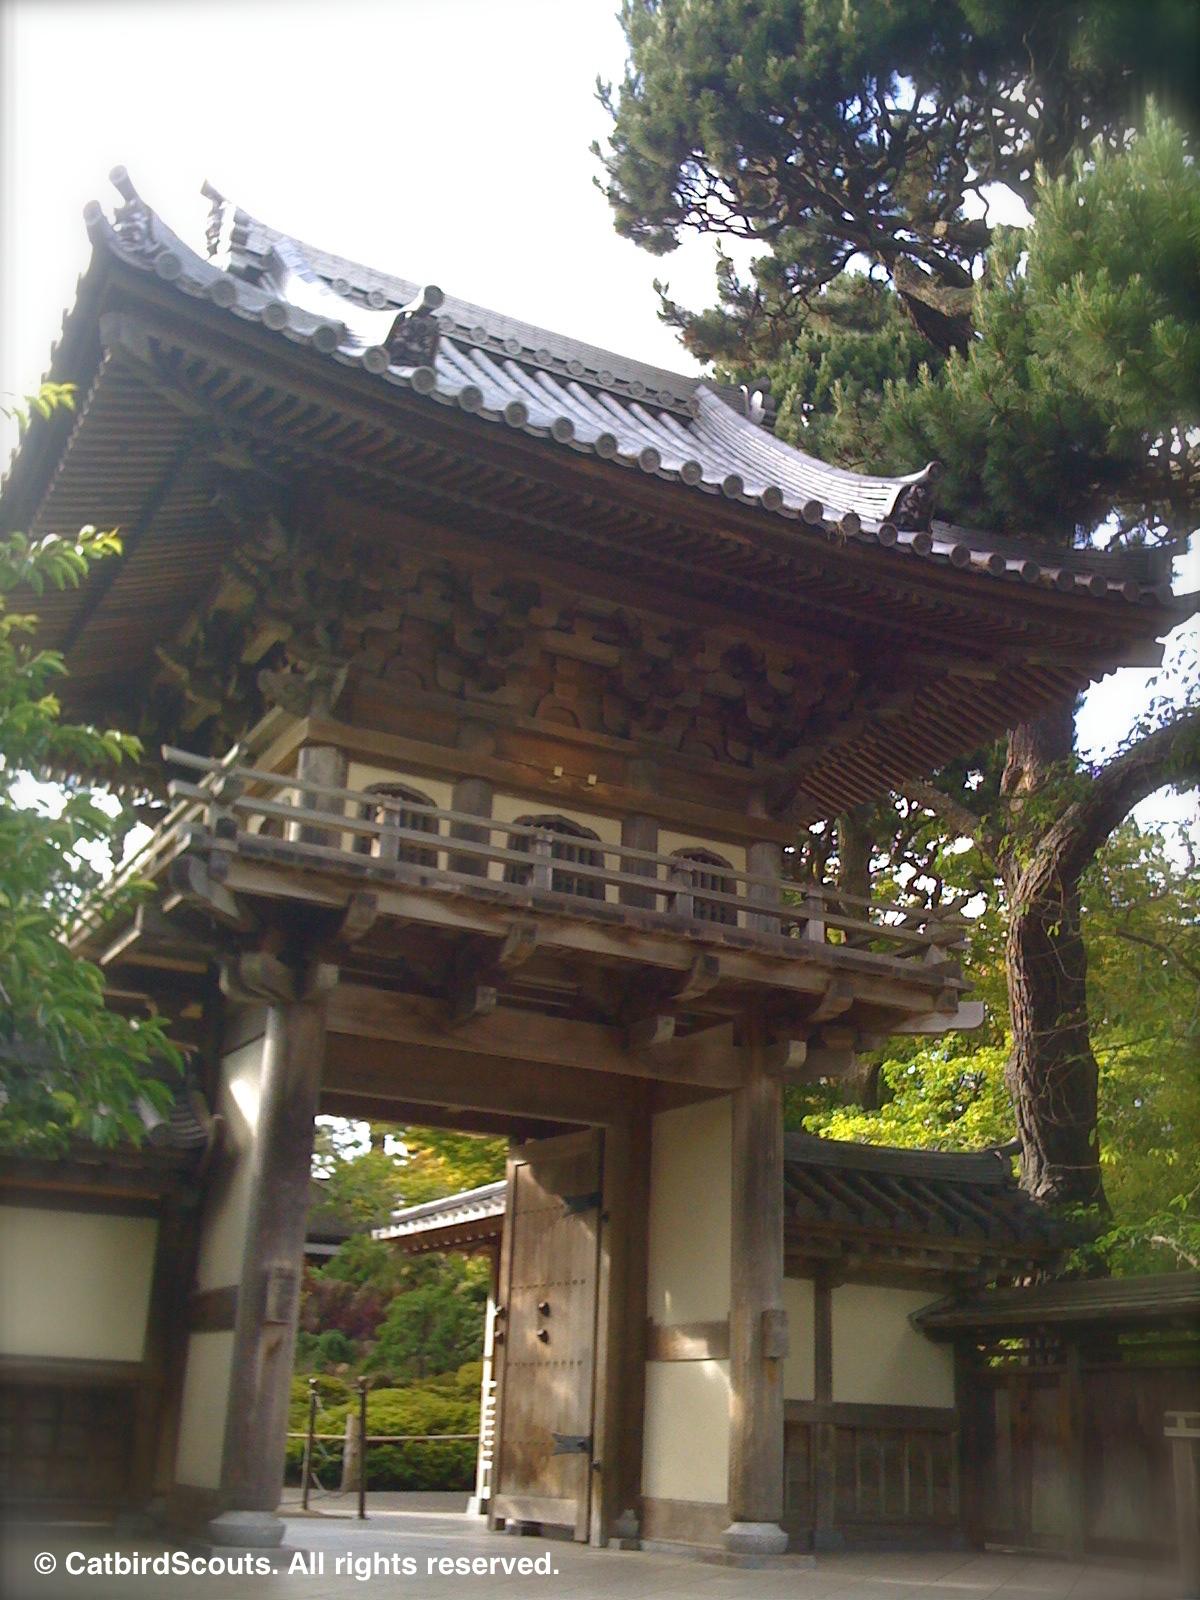 JapaneseTeaGarden-Catbird-Scouts